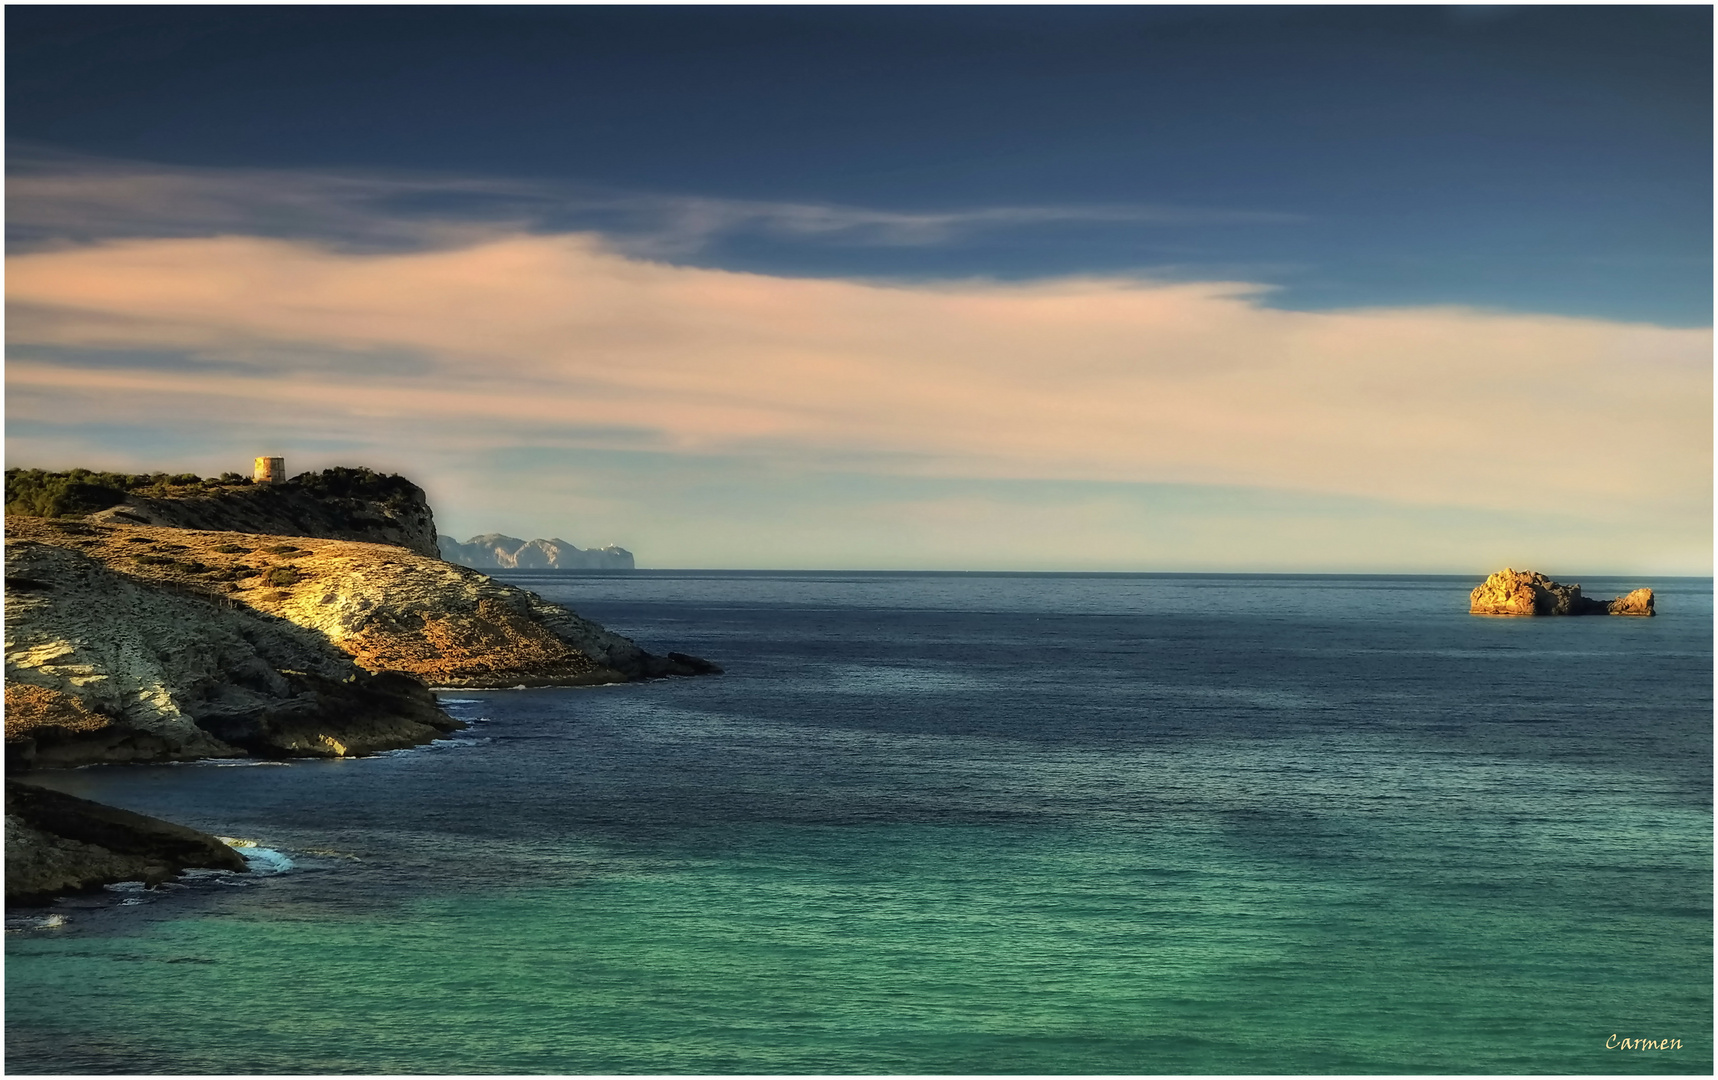 El mediterráneo, mi mar....